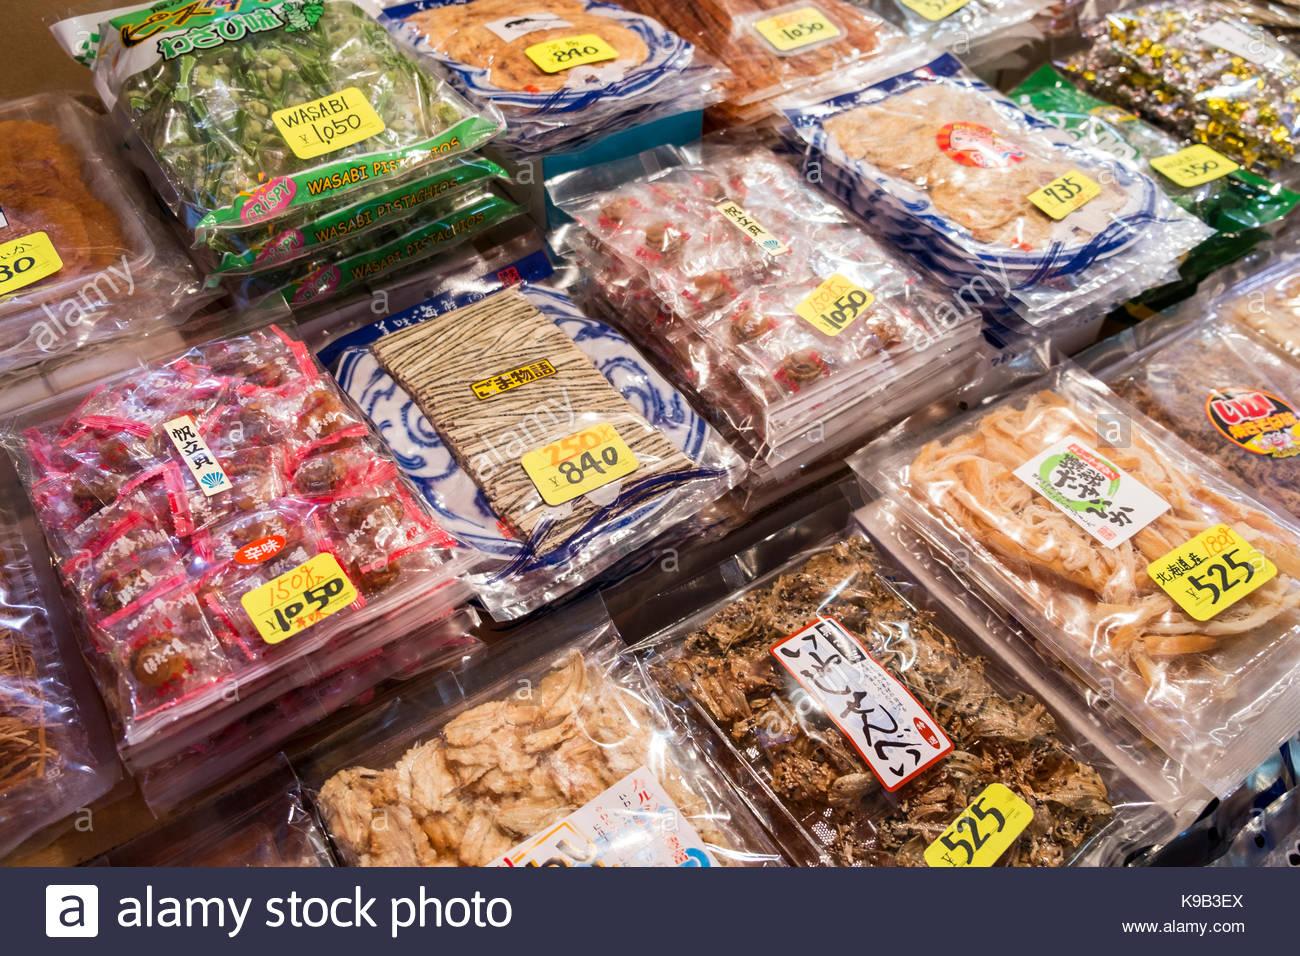 Tsukiji market stock photos tsukiji market stock images for Wholesale fish market